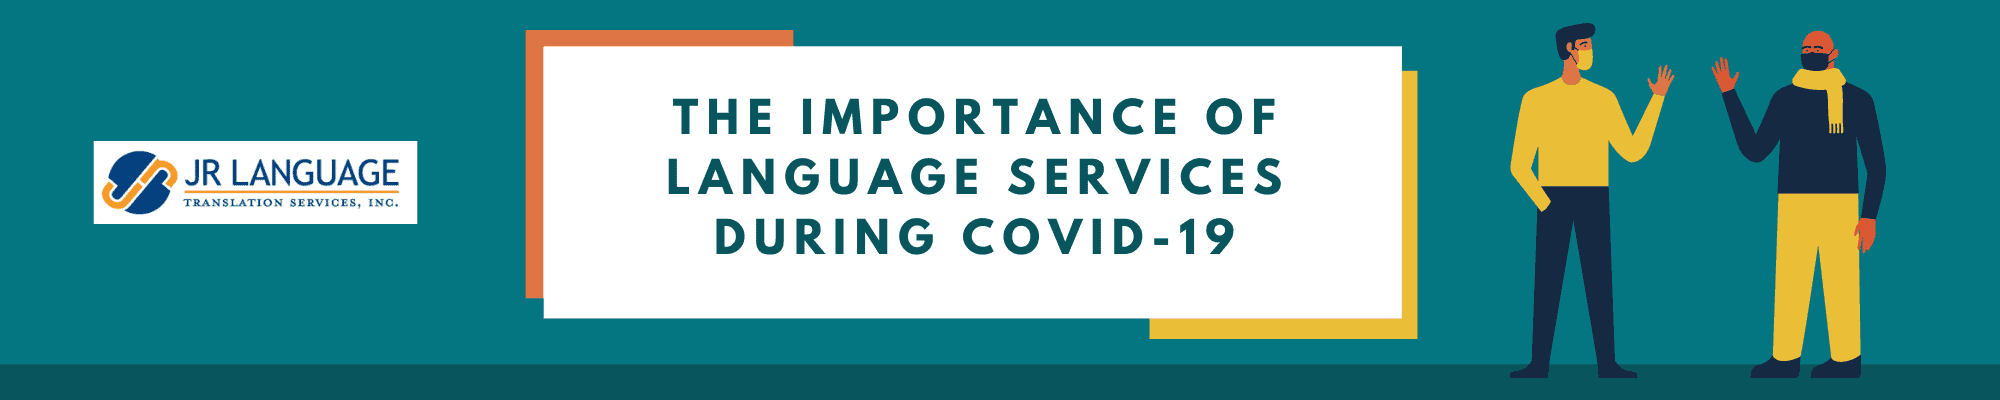 Professional Translation Services Covid-19